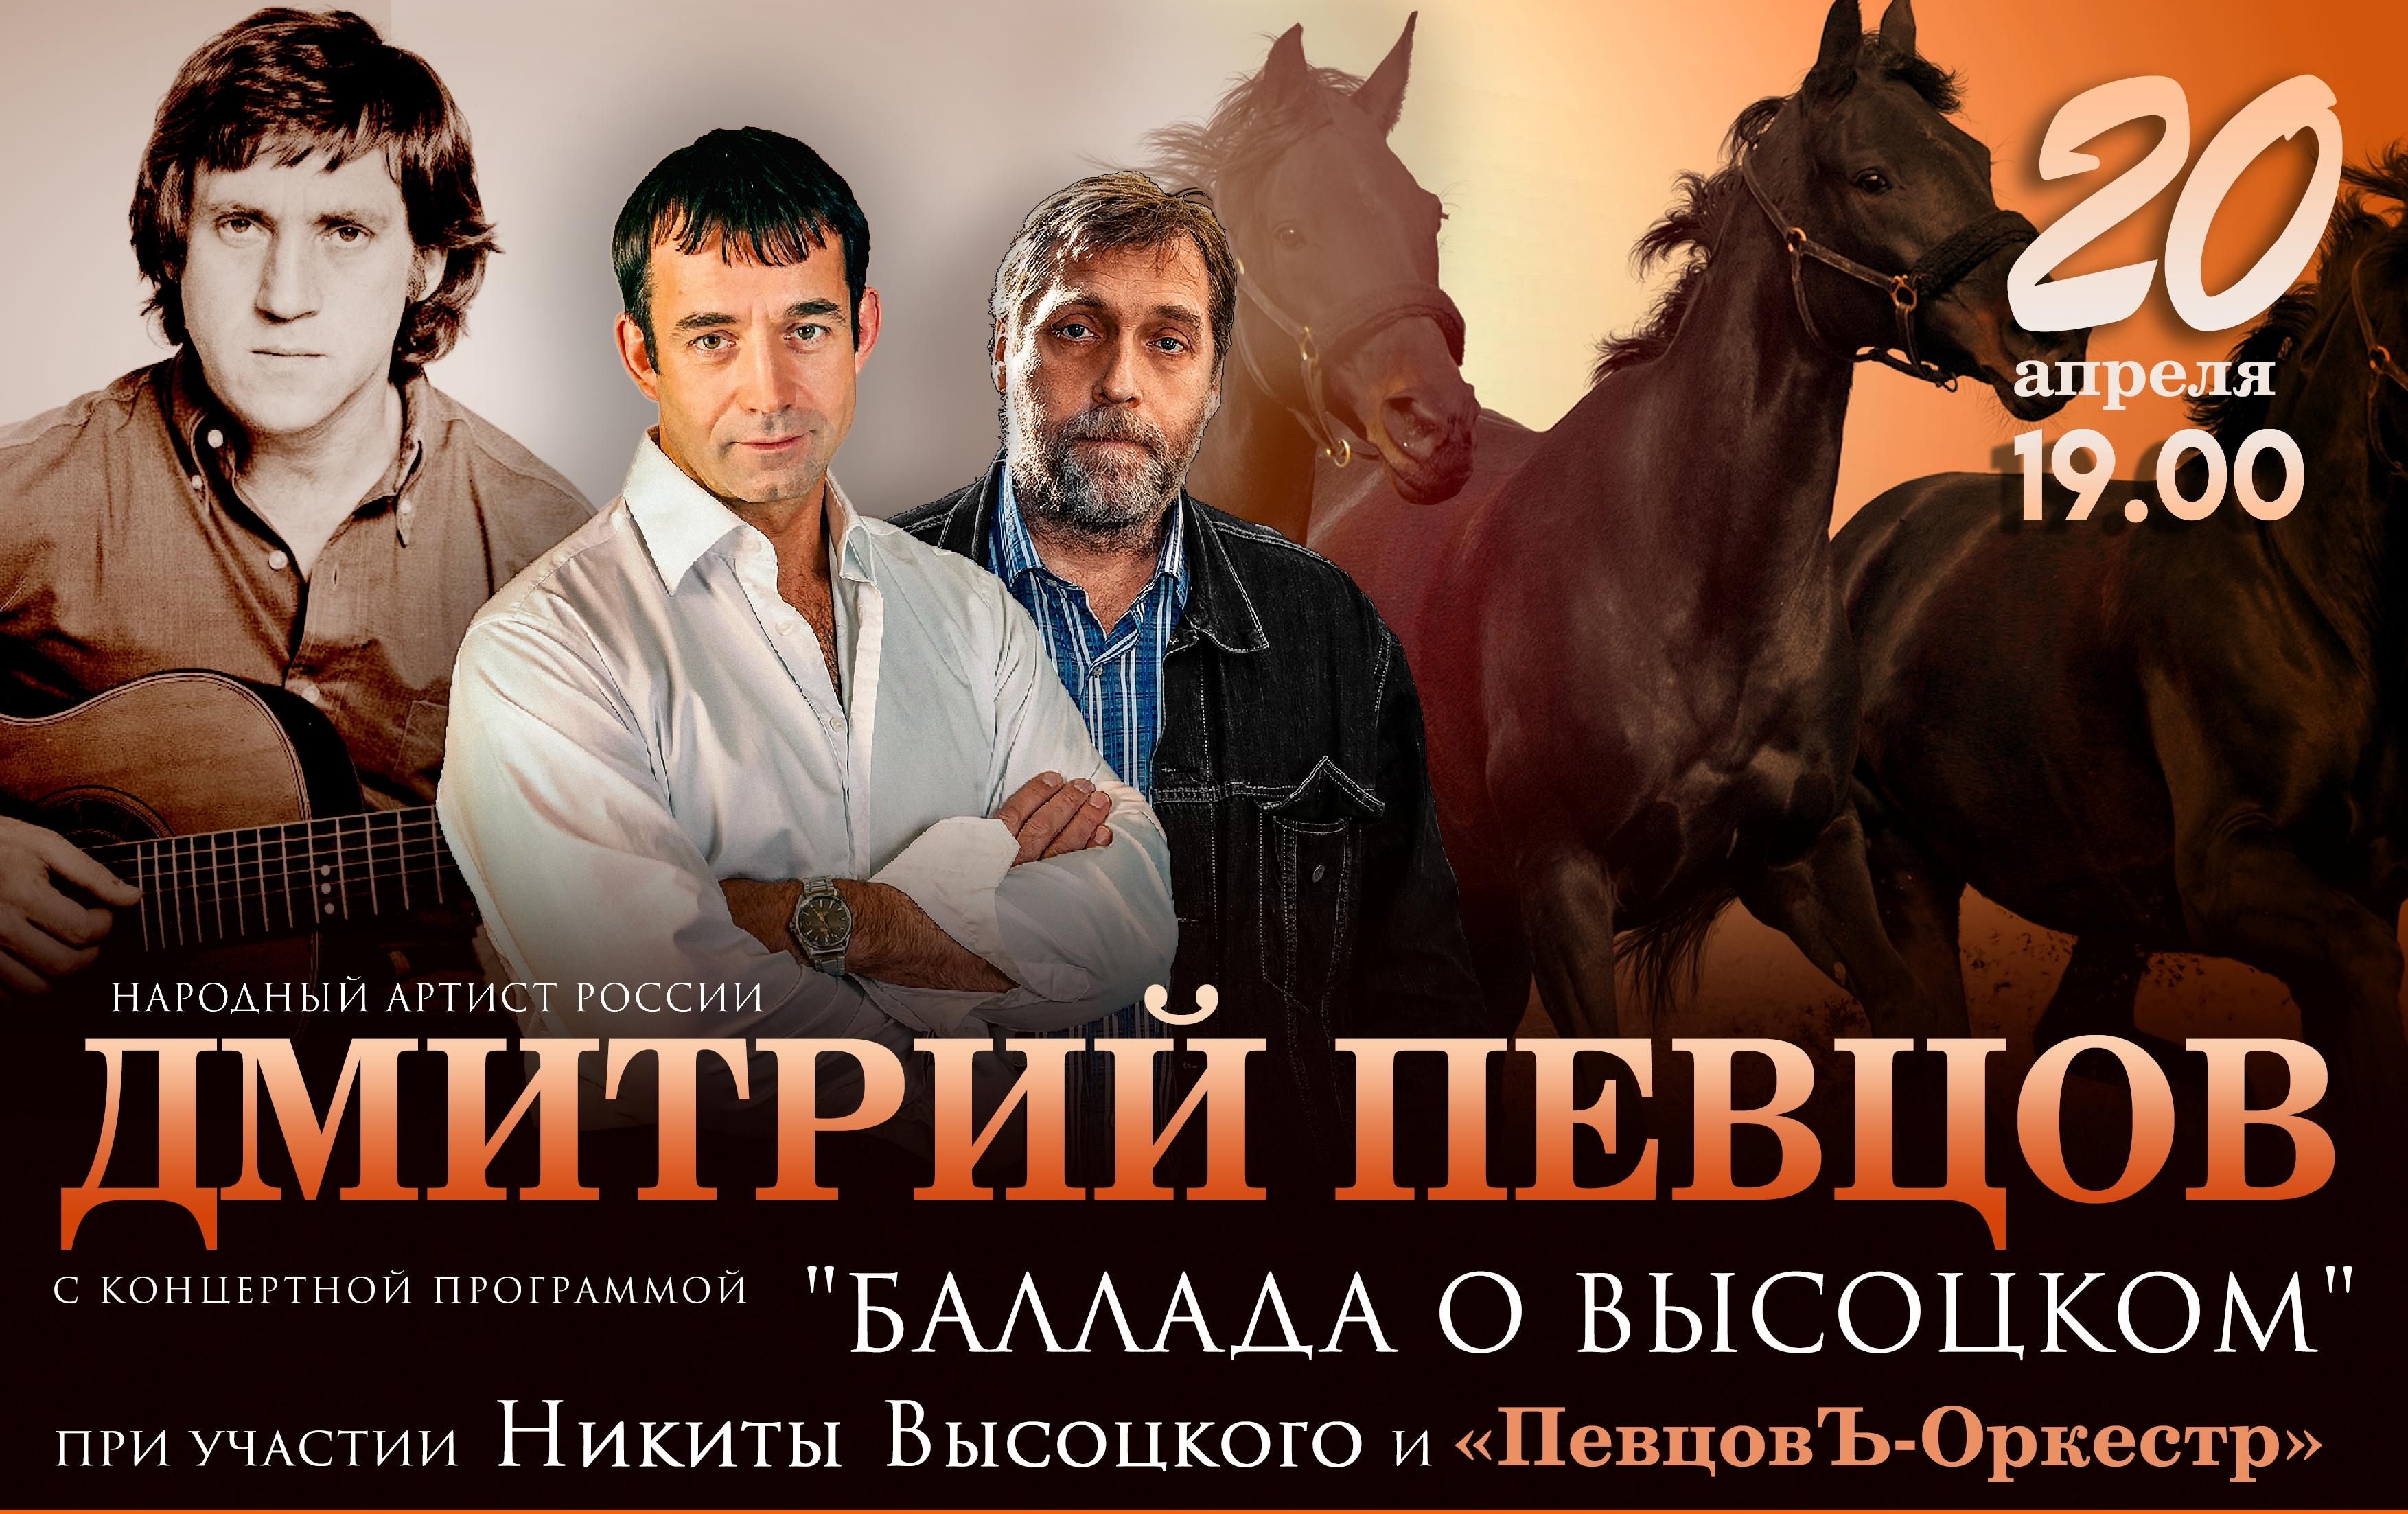 "Дмитрий Певцов""Баллада о Высоцком"""